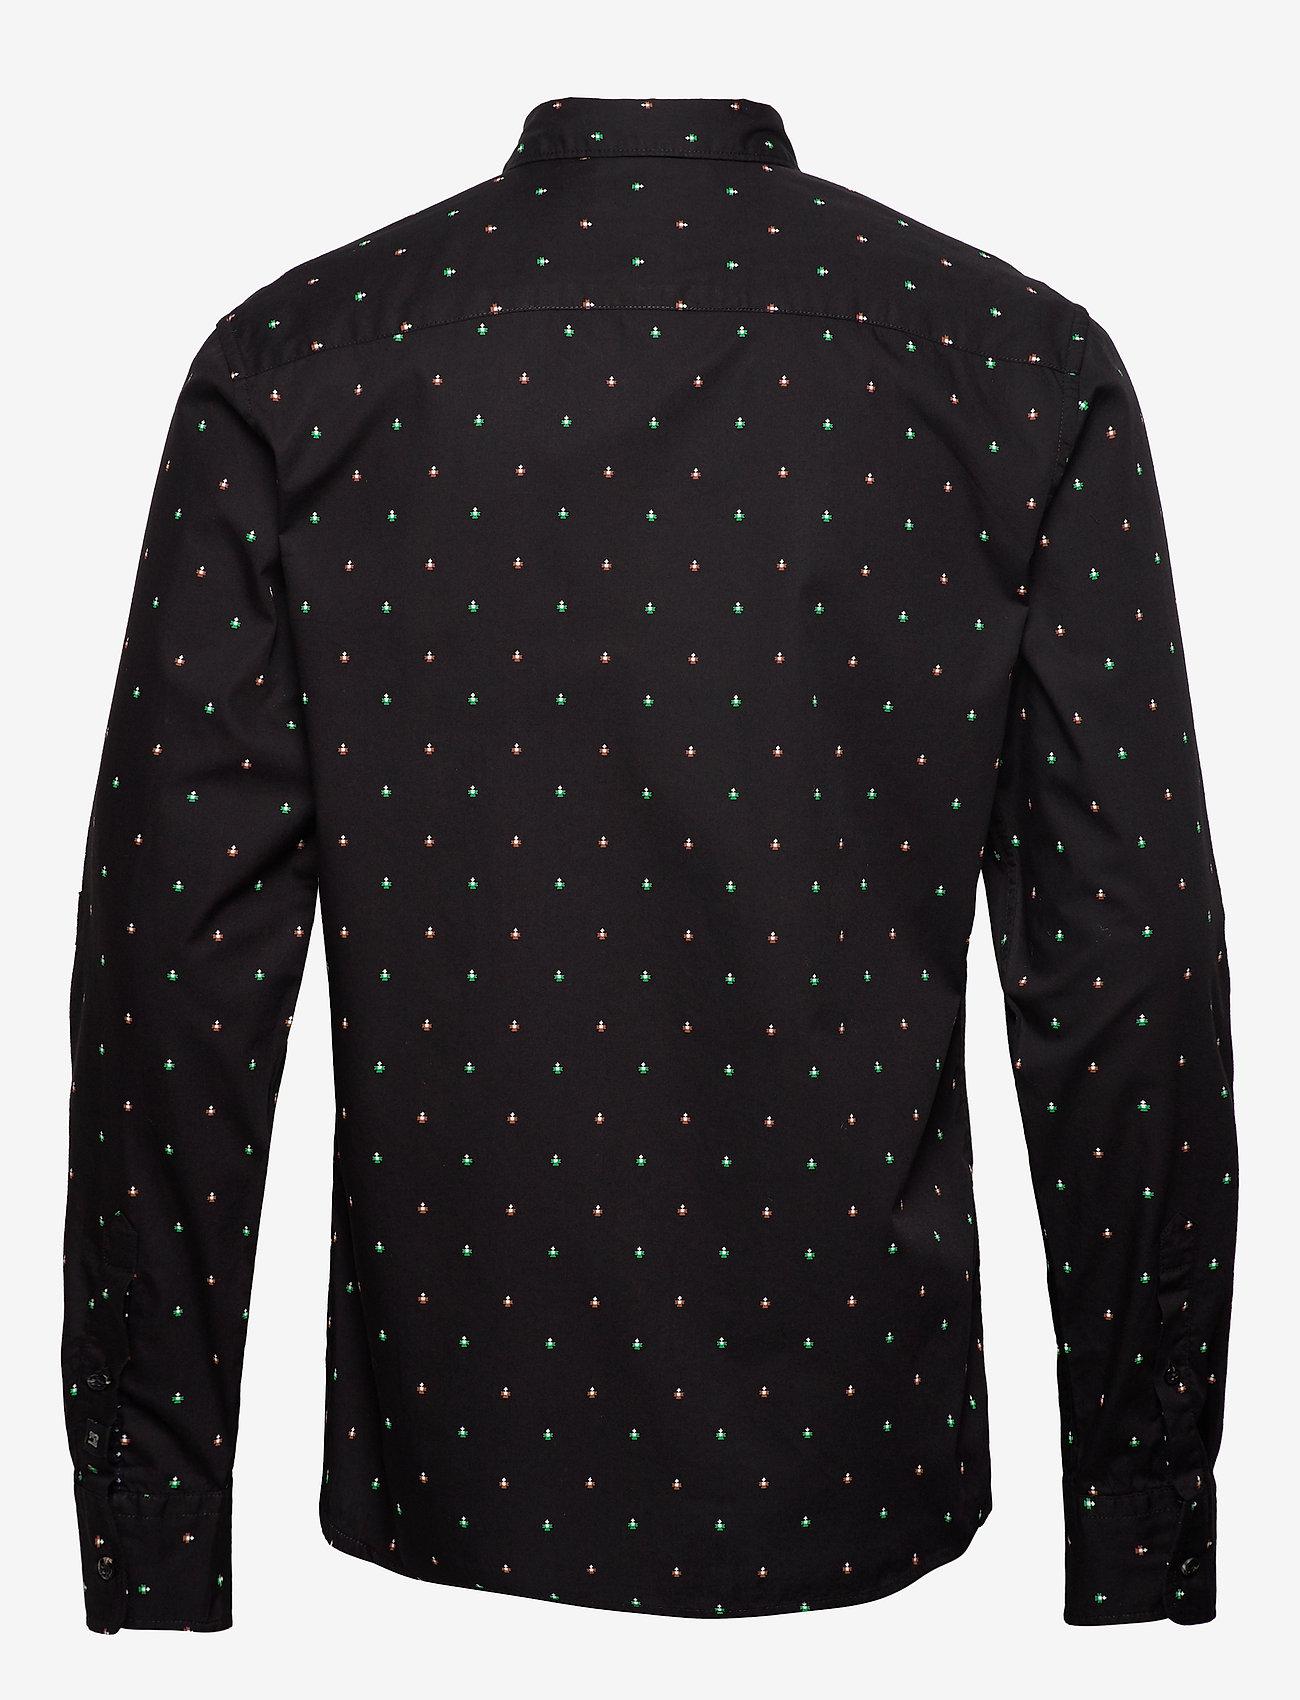 Scotch & Soda - REGULAR FIT- Classic all-over printed pochet shirt - chemises d'affaires - combo e - 1